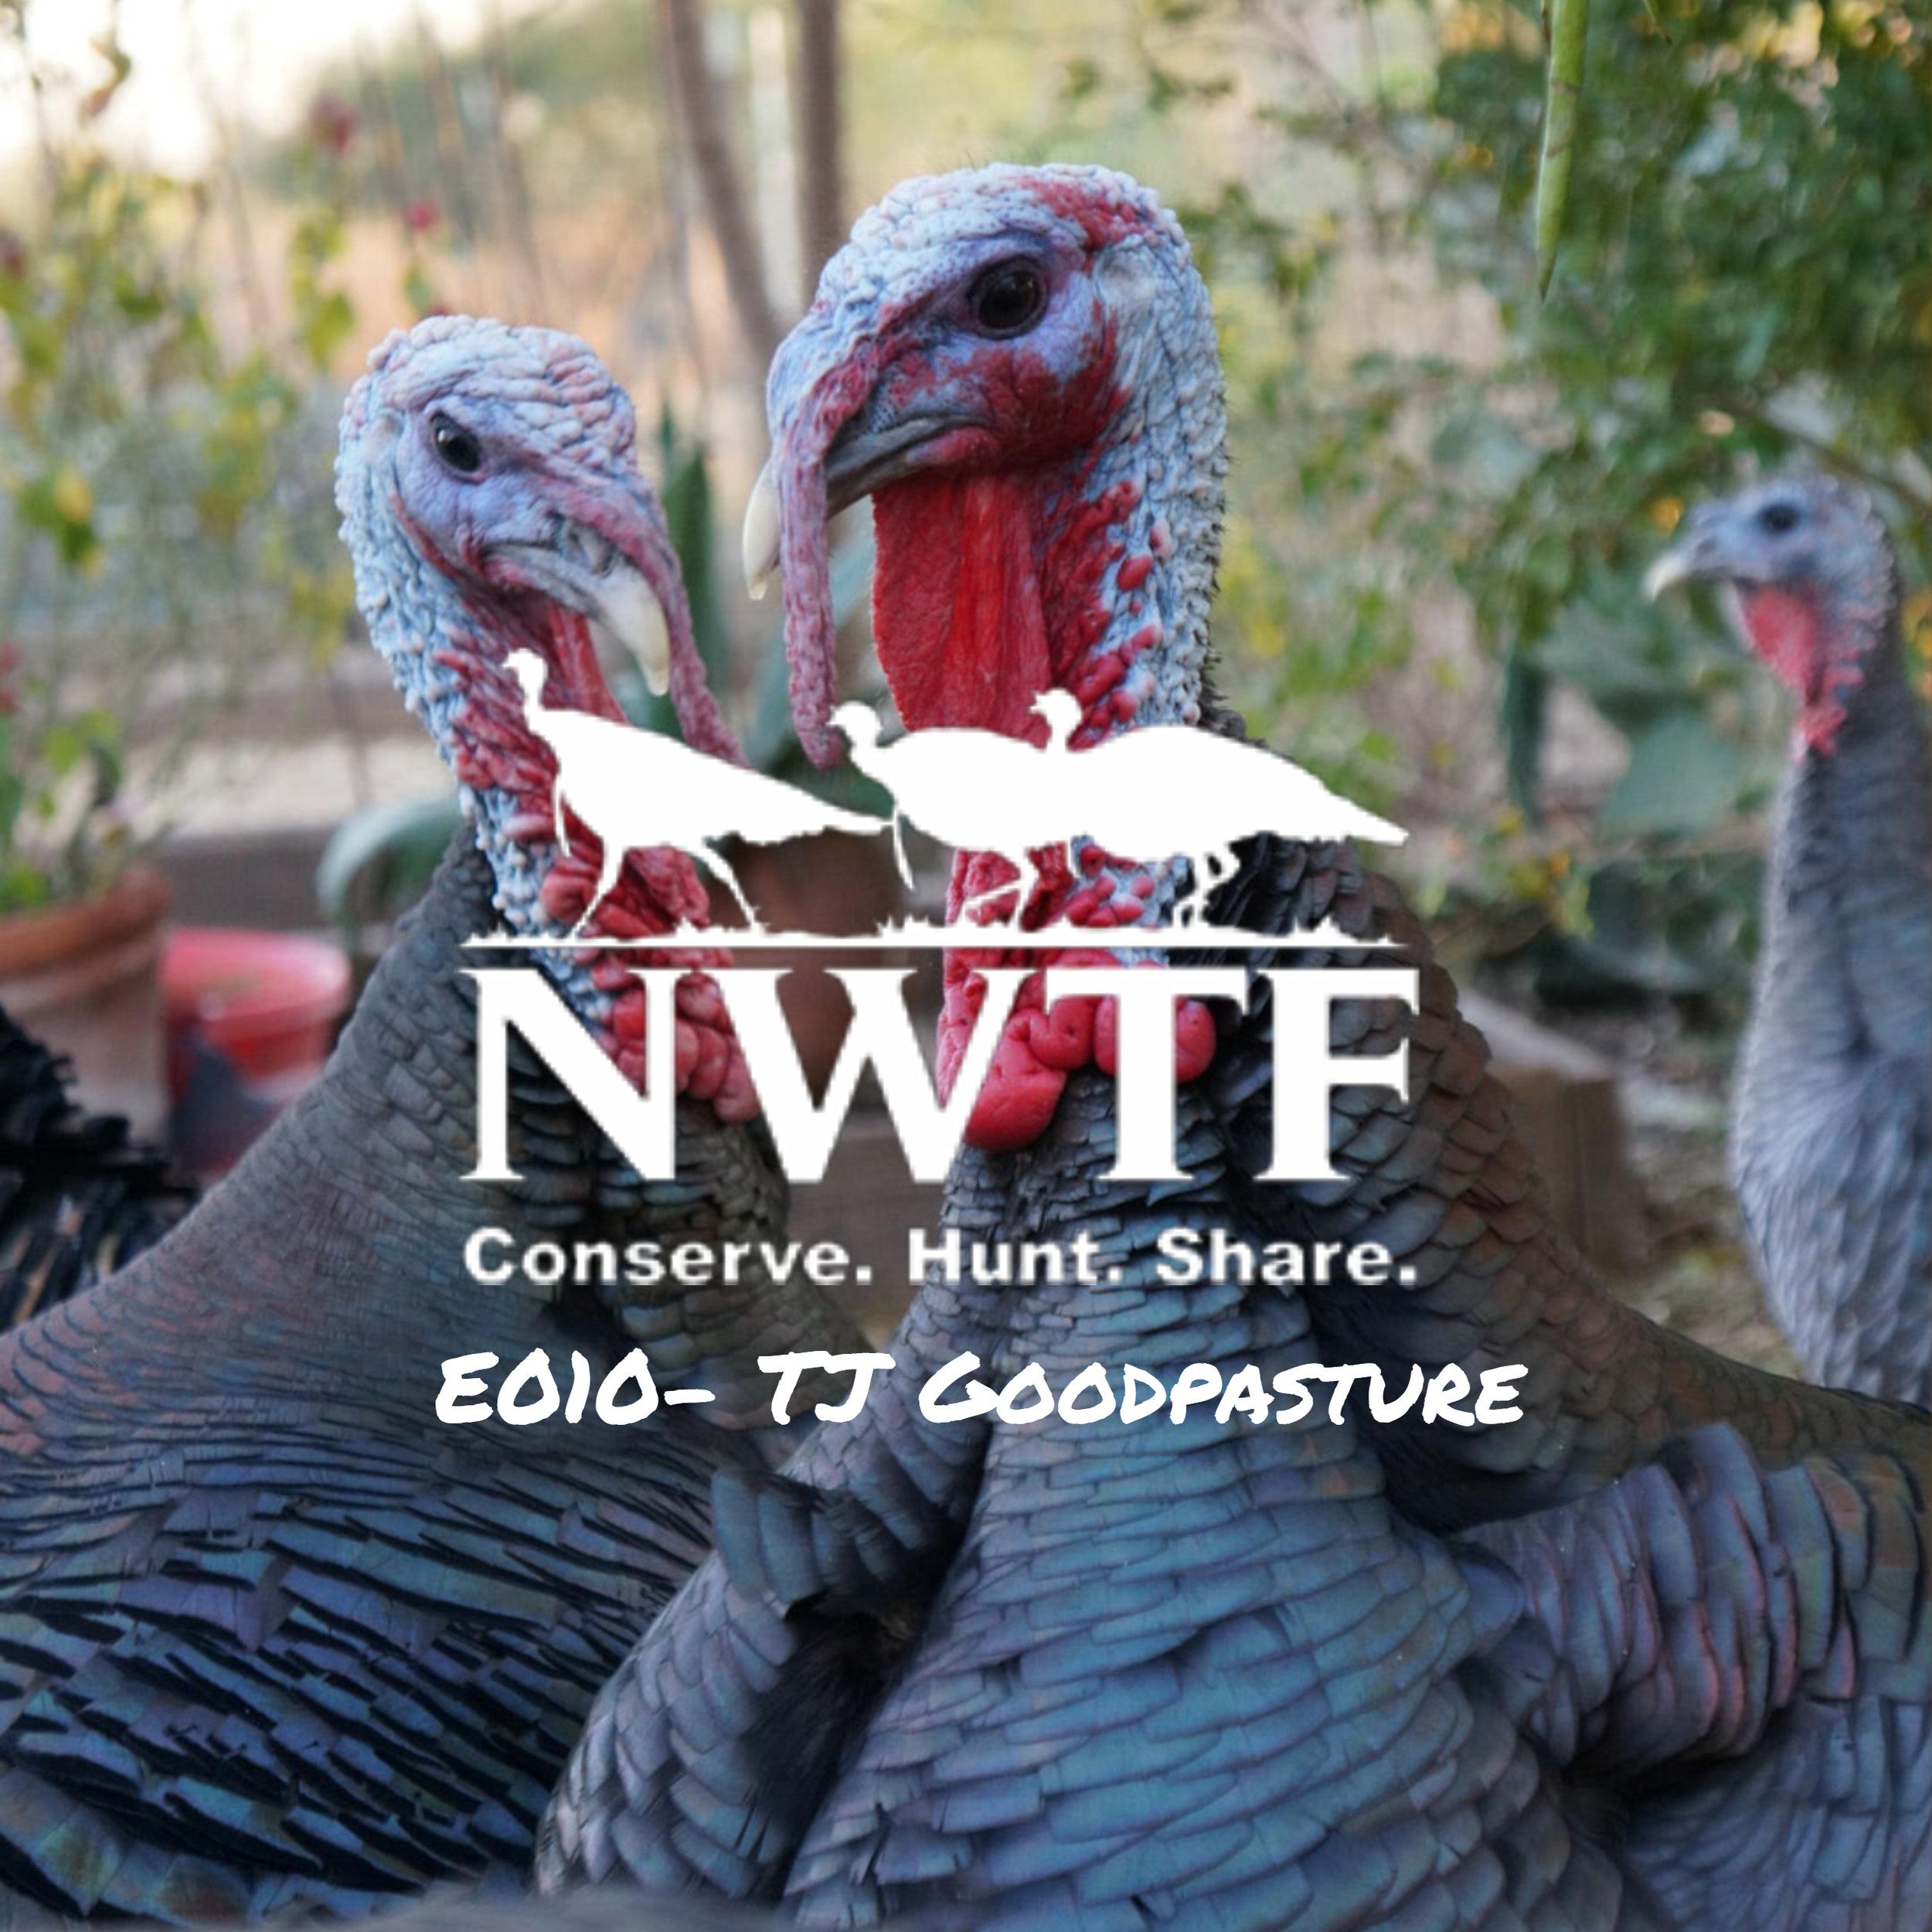 Turkey with TJ Goodpasture -